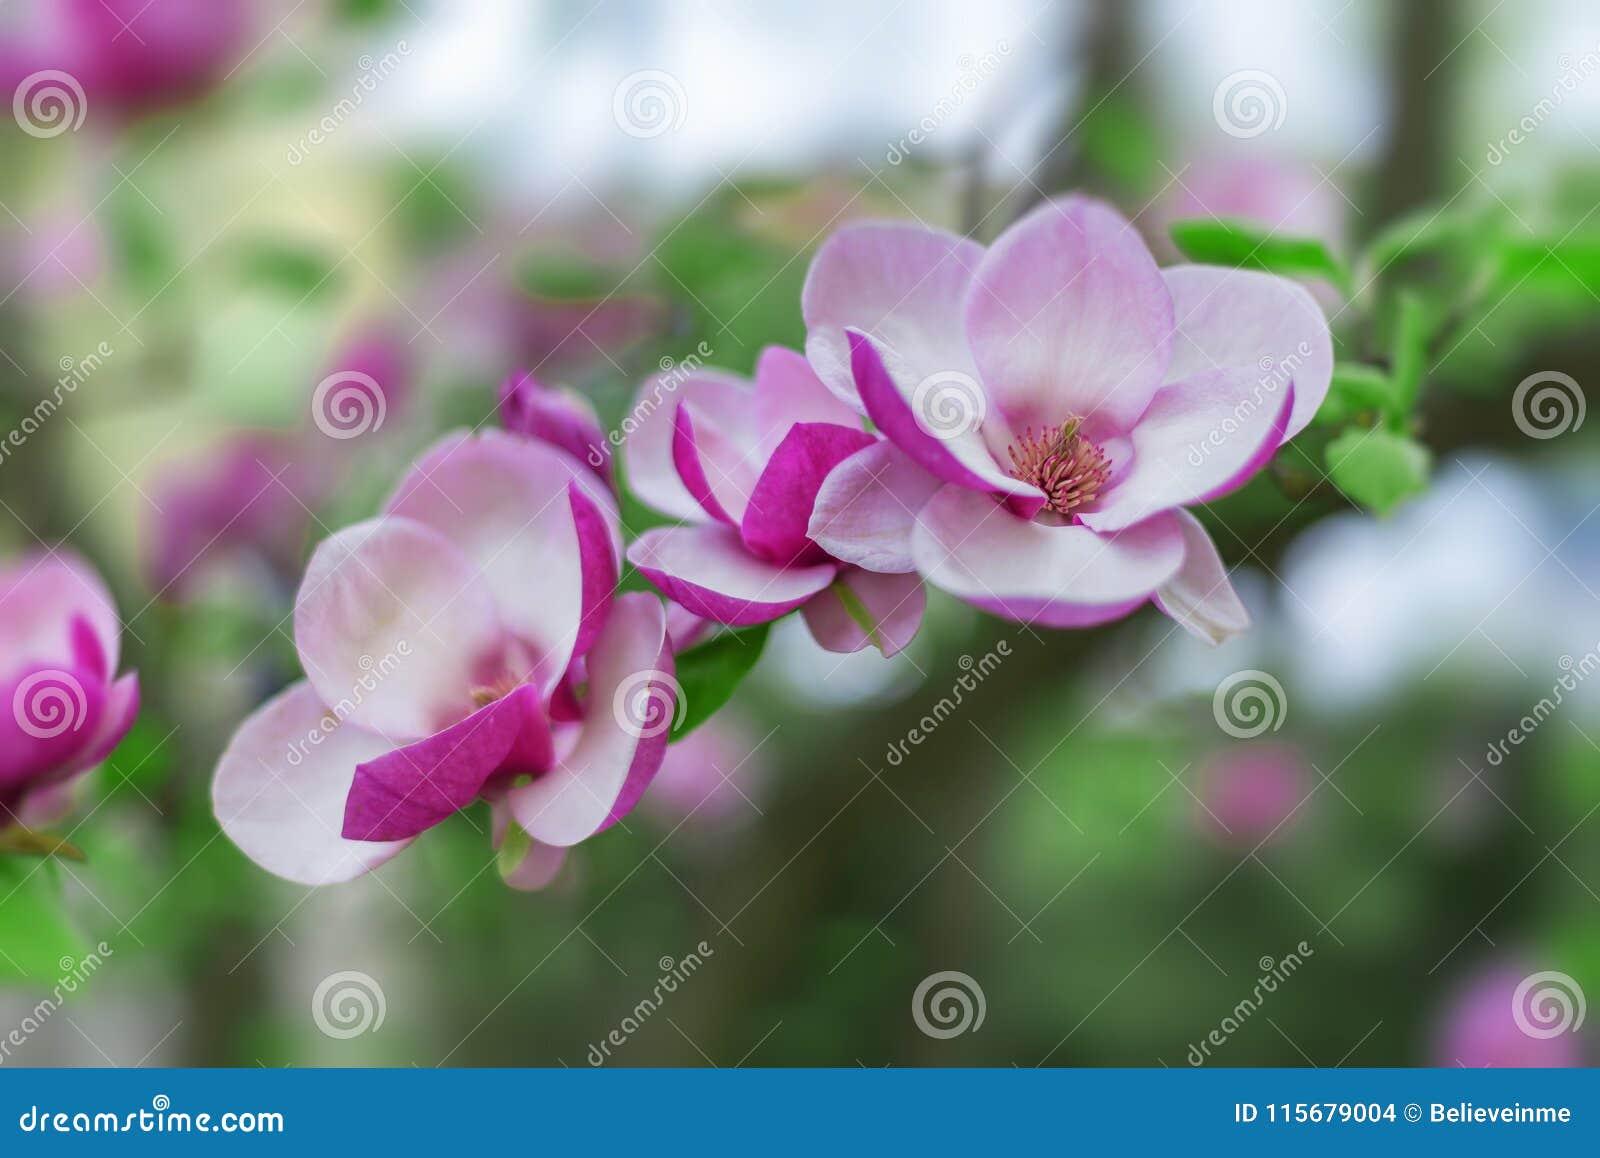 Magnolia Tree In Bloom Beautiful Purple Flowers In Spring Stock